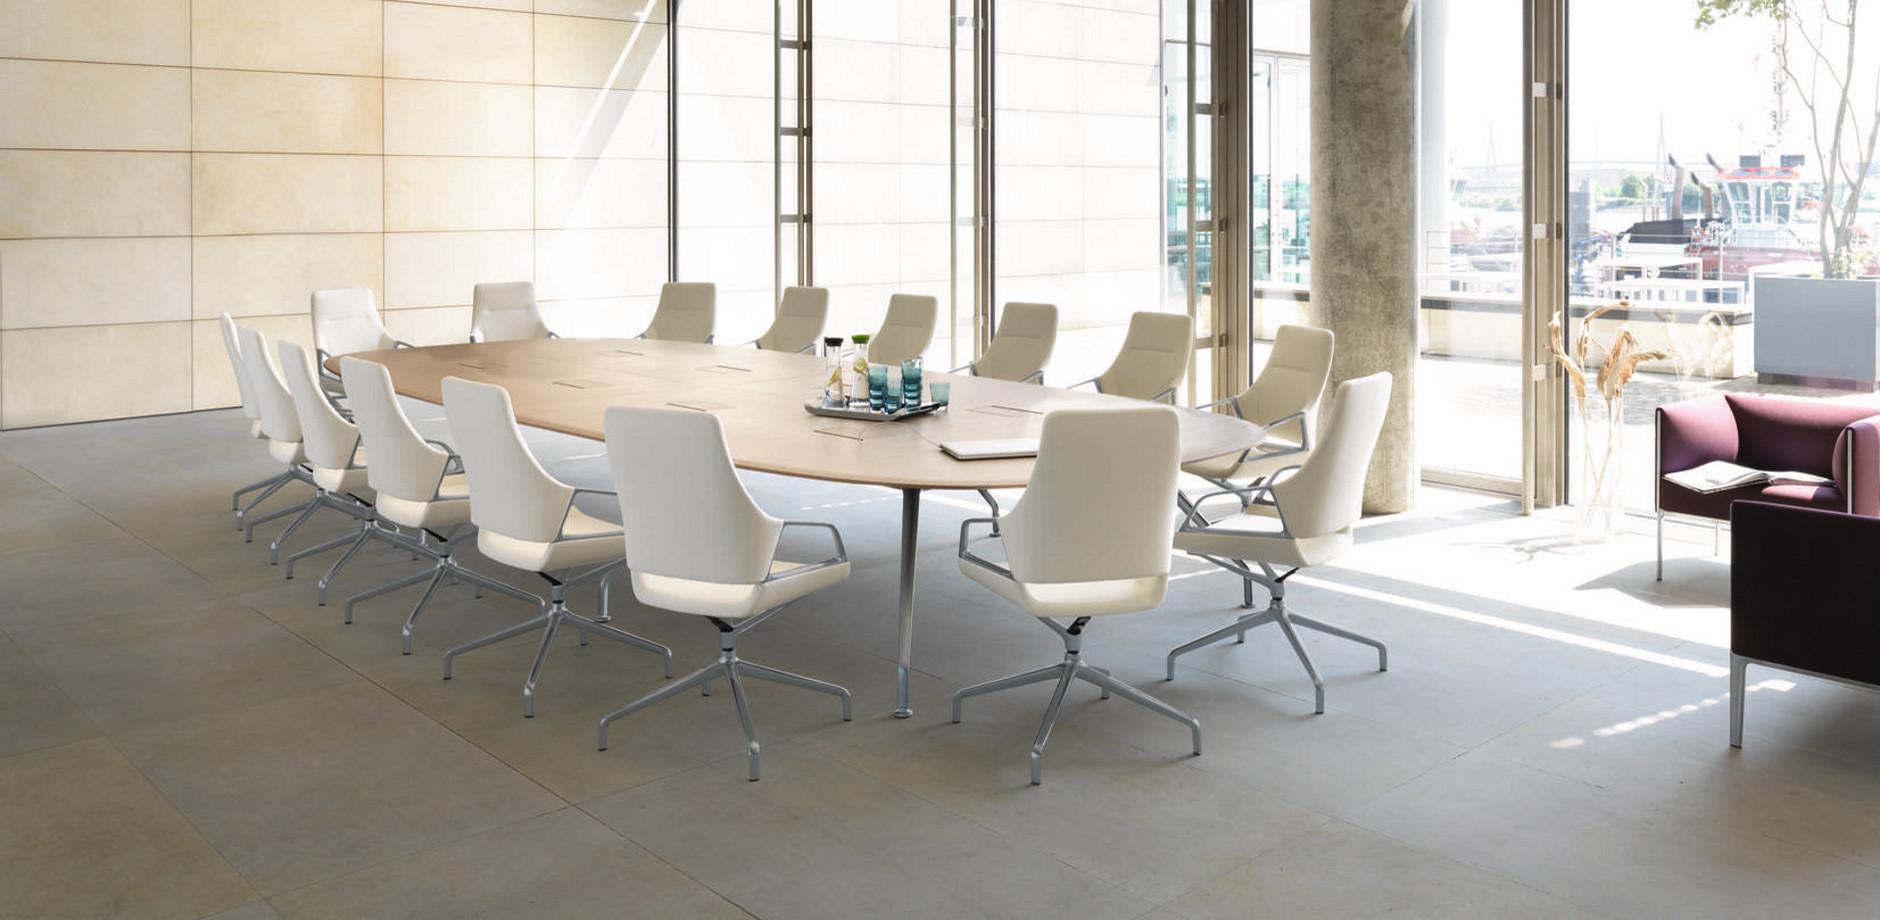 Designer Büromöbel – moderne Gestaltung am Arbeitsplatz | Tendenza